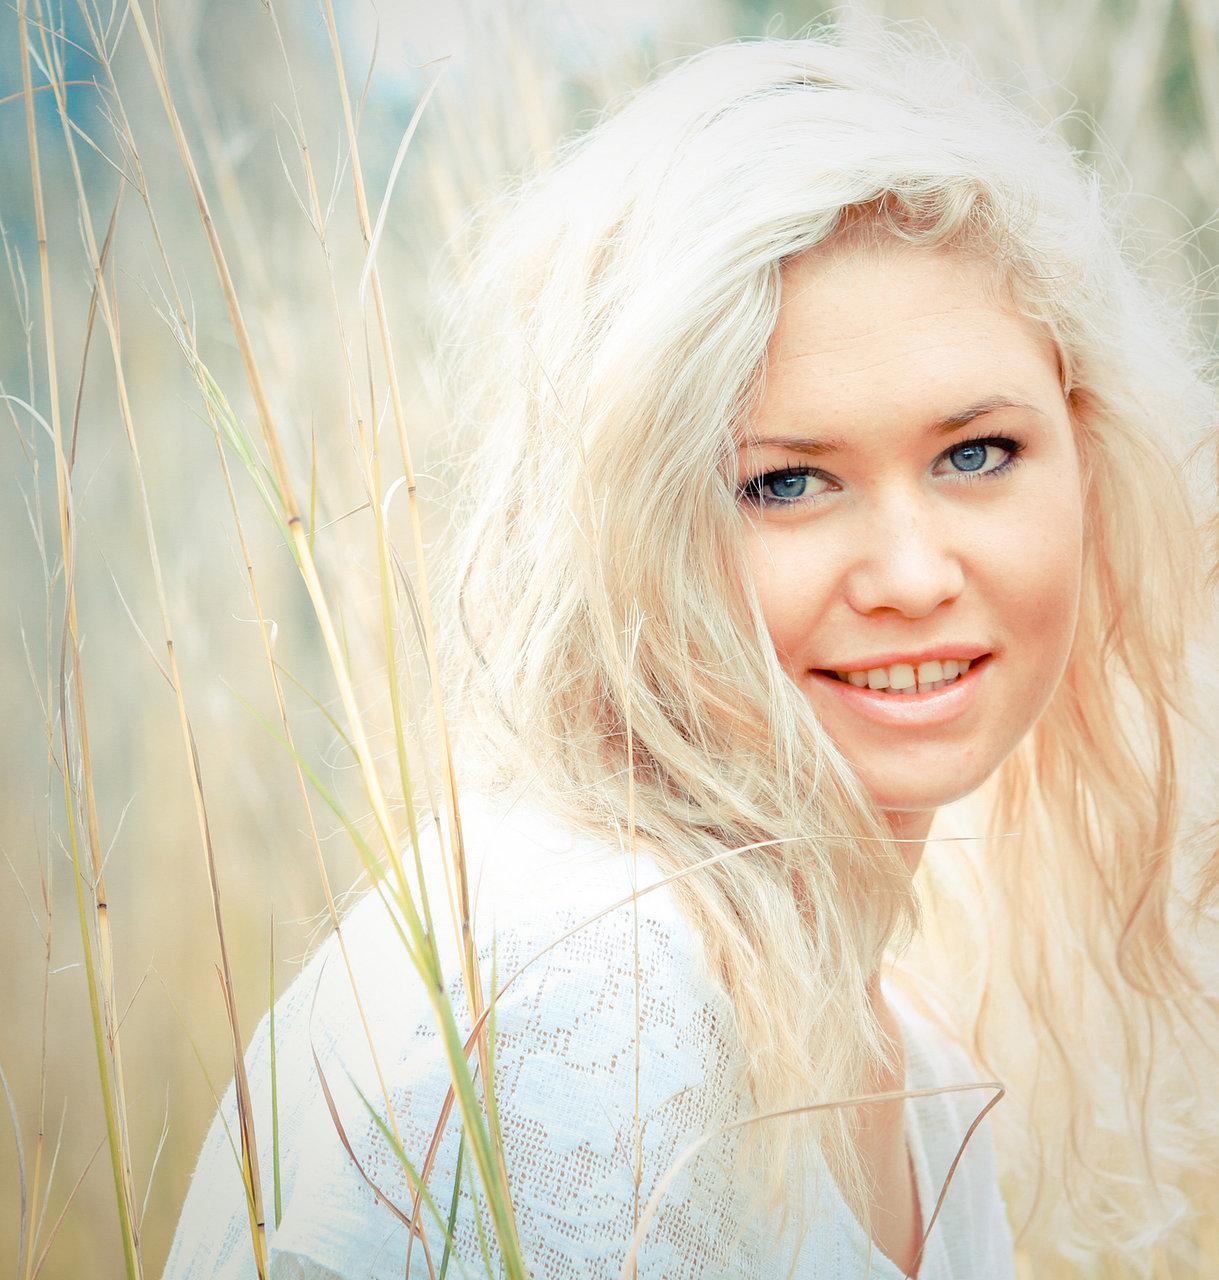 photo+shoot+1006-4.jpg